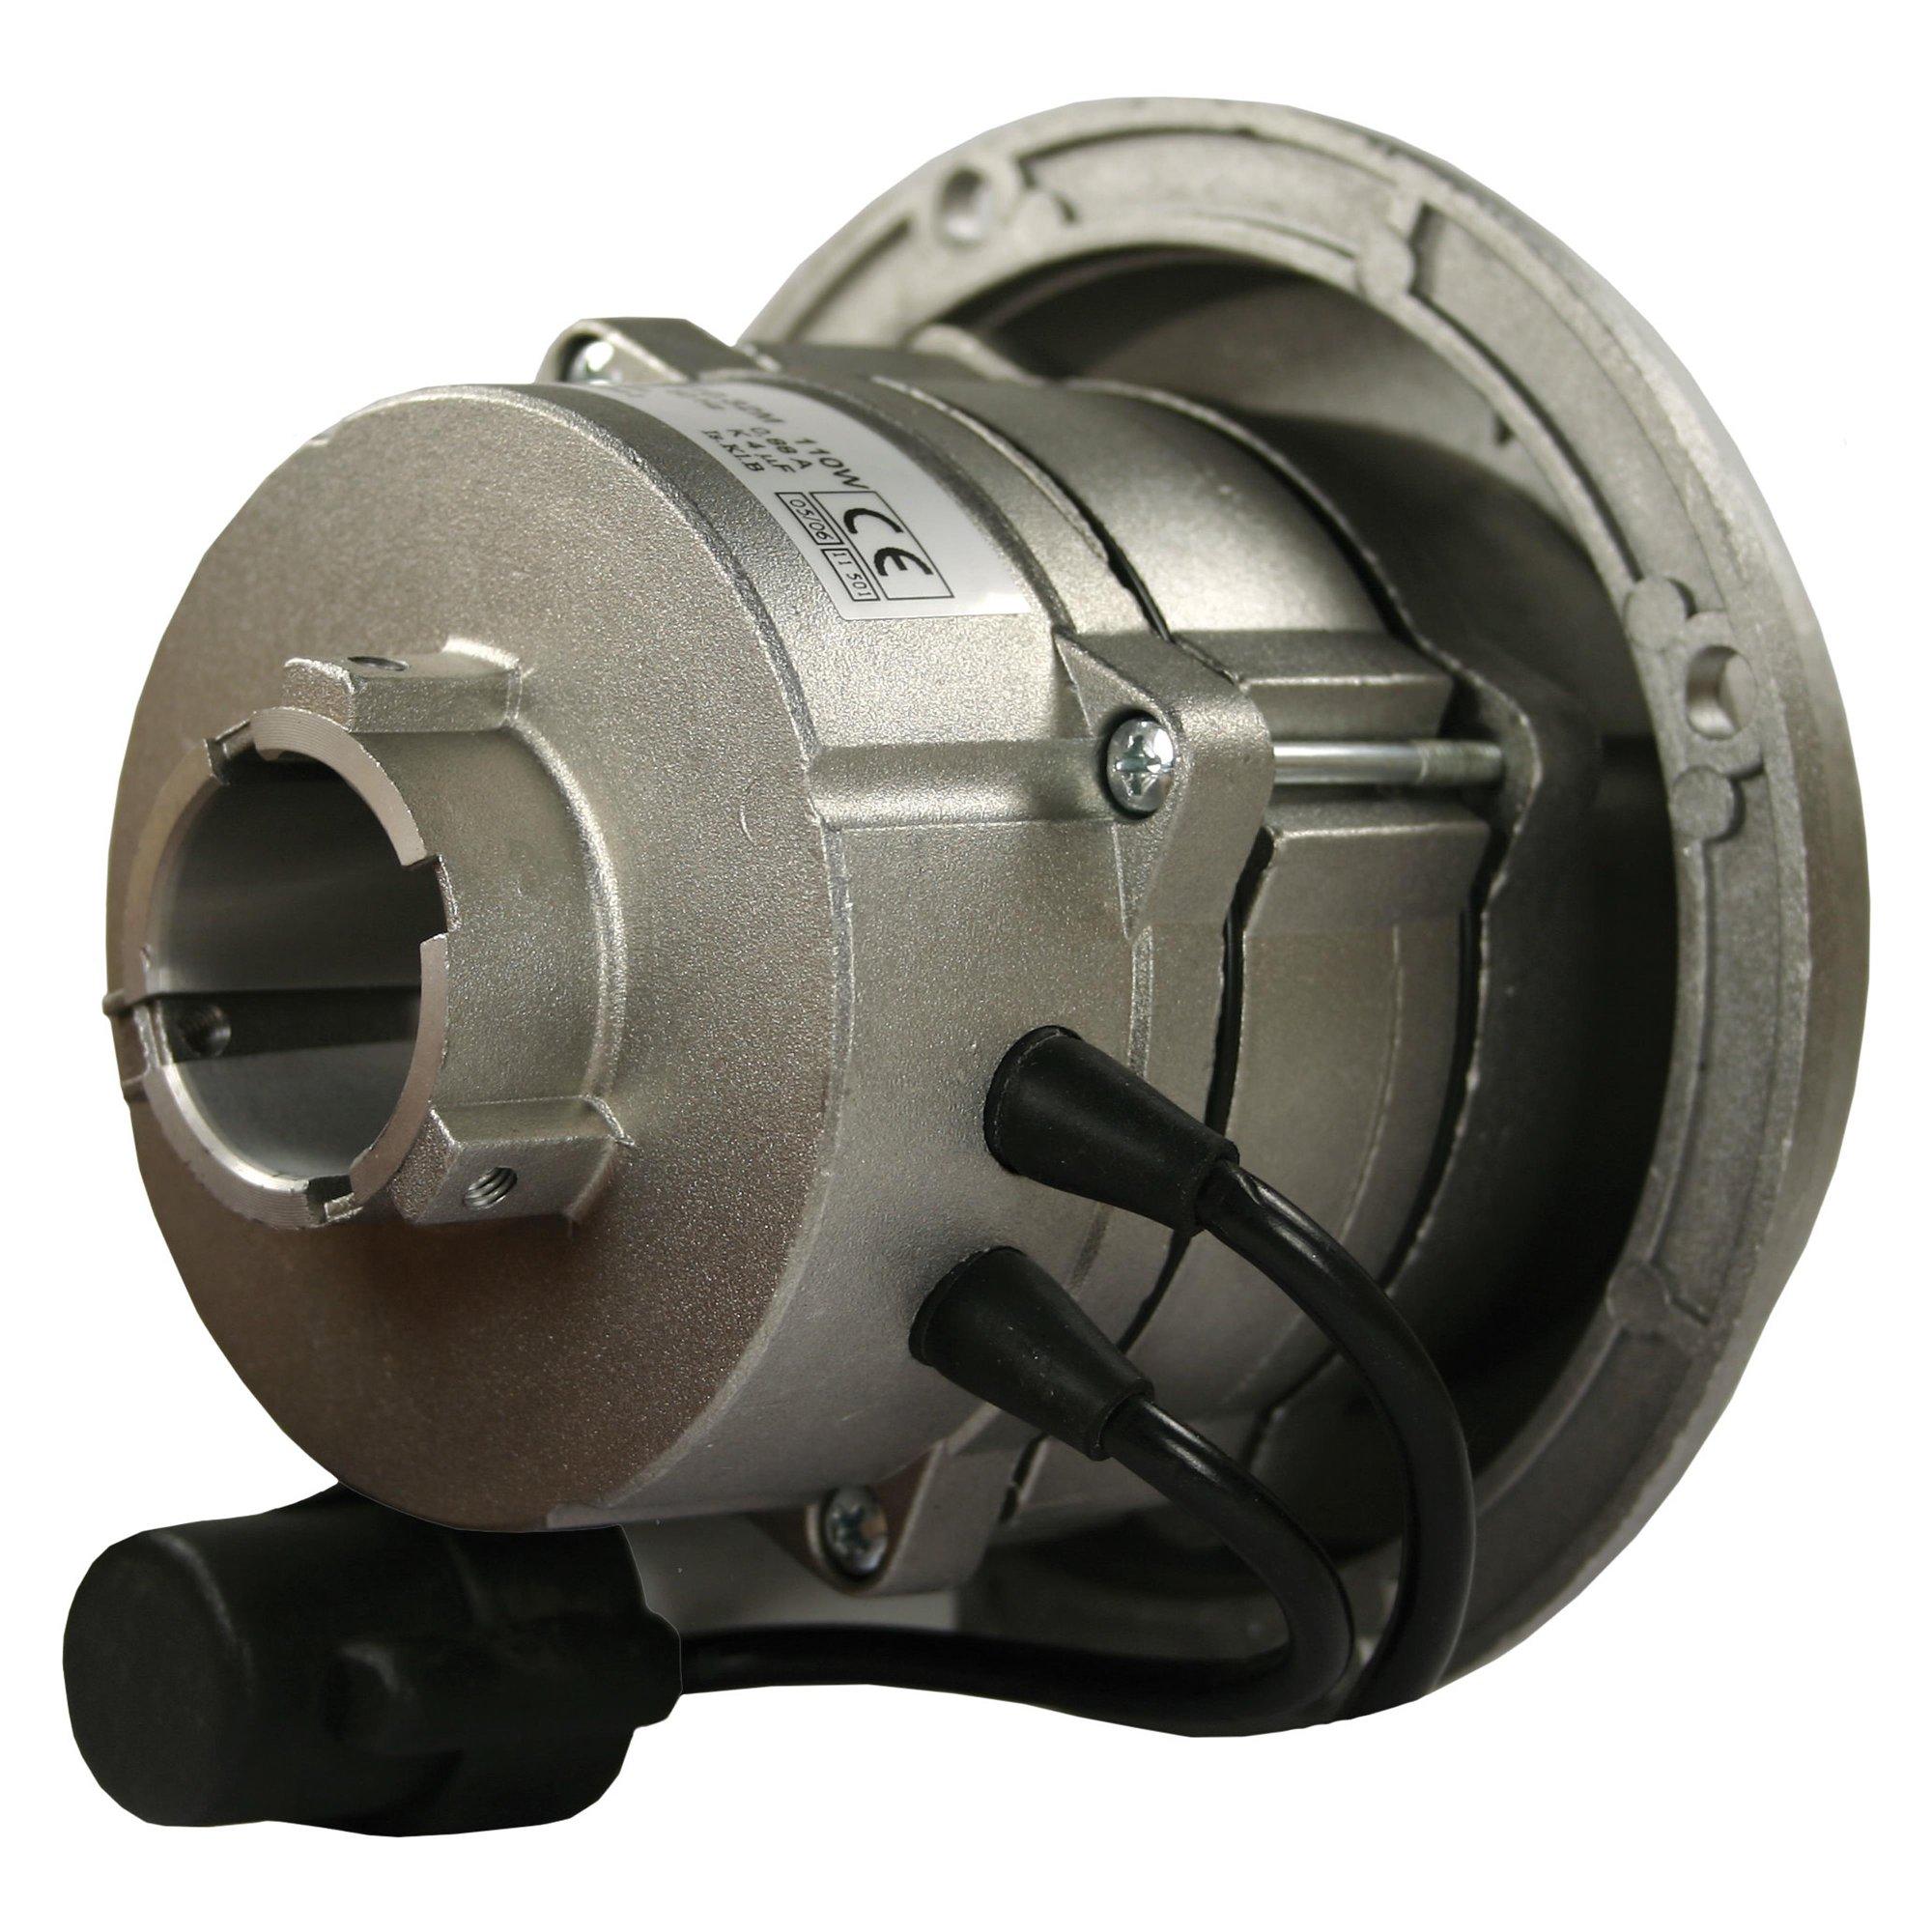 Markenlos Brennermotor mit Flansch u. Pumpenaufn. 32mm; 110W; 230V/50Hz Brennermotor 110 W 230V 50Hz F   60.2.110.32 MDIC